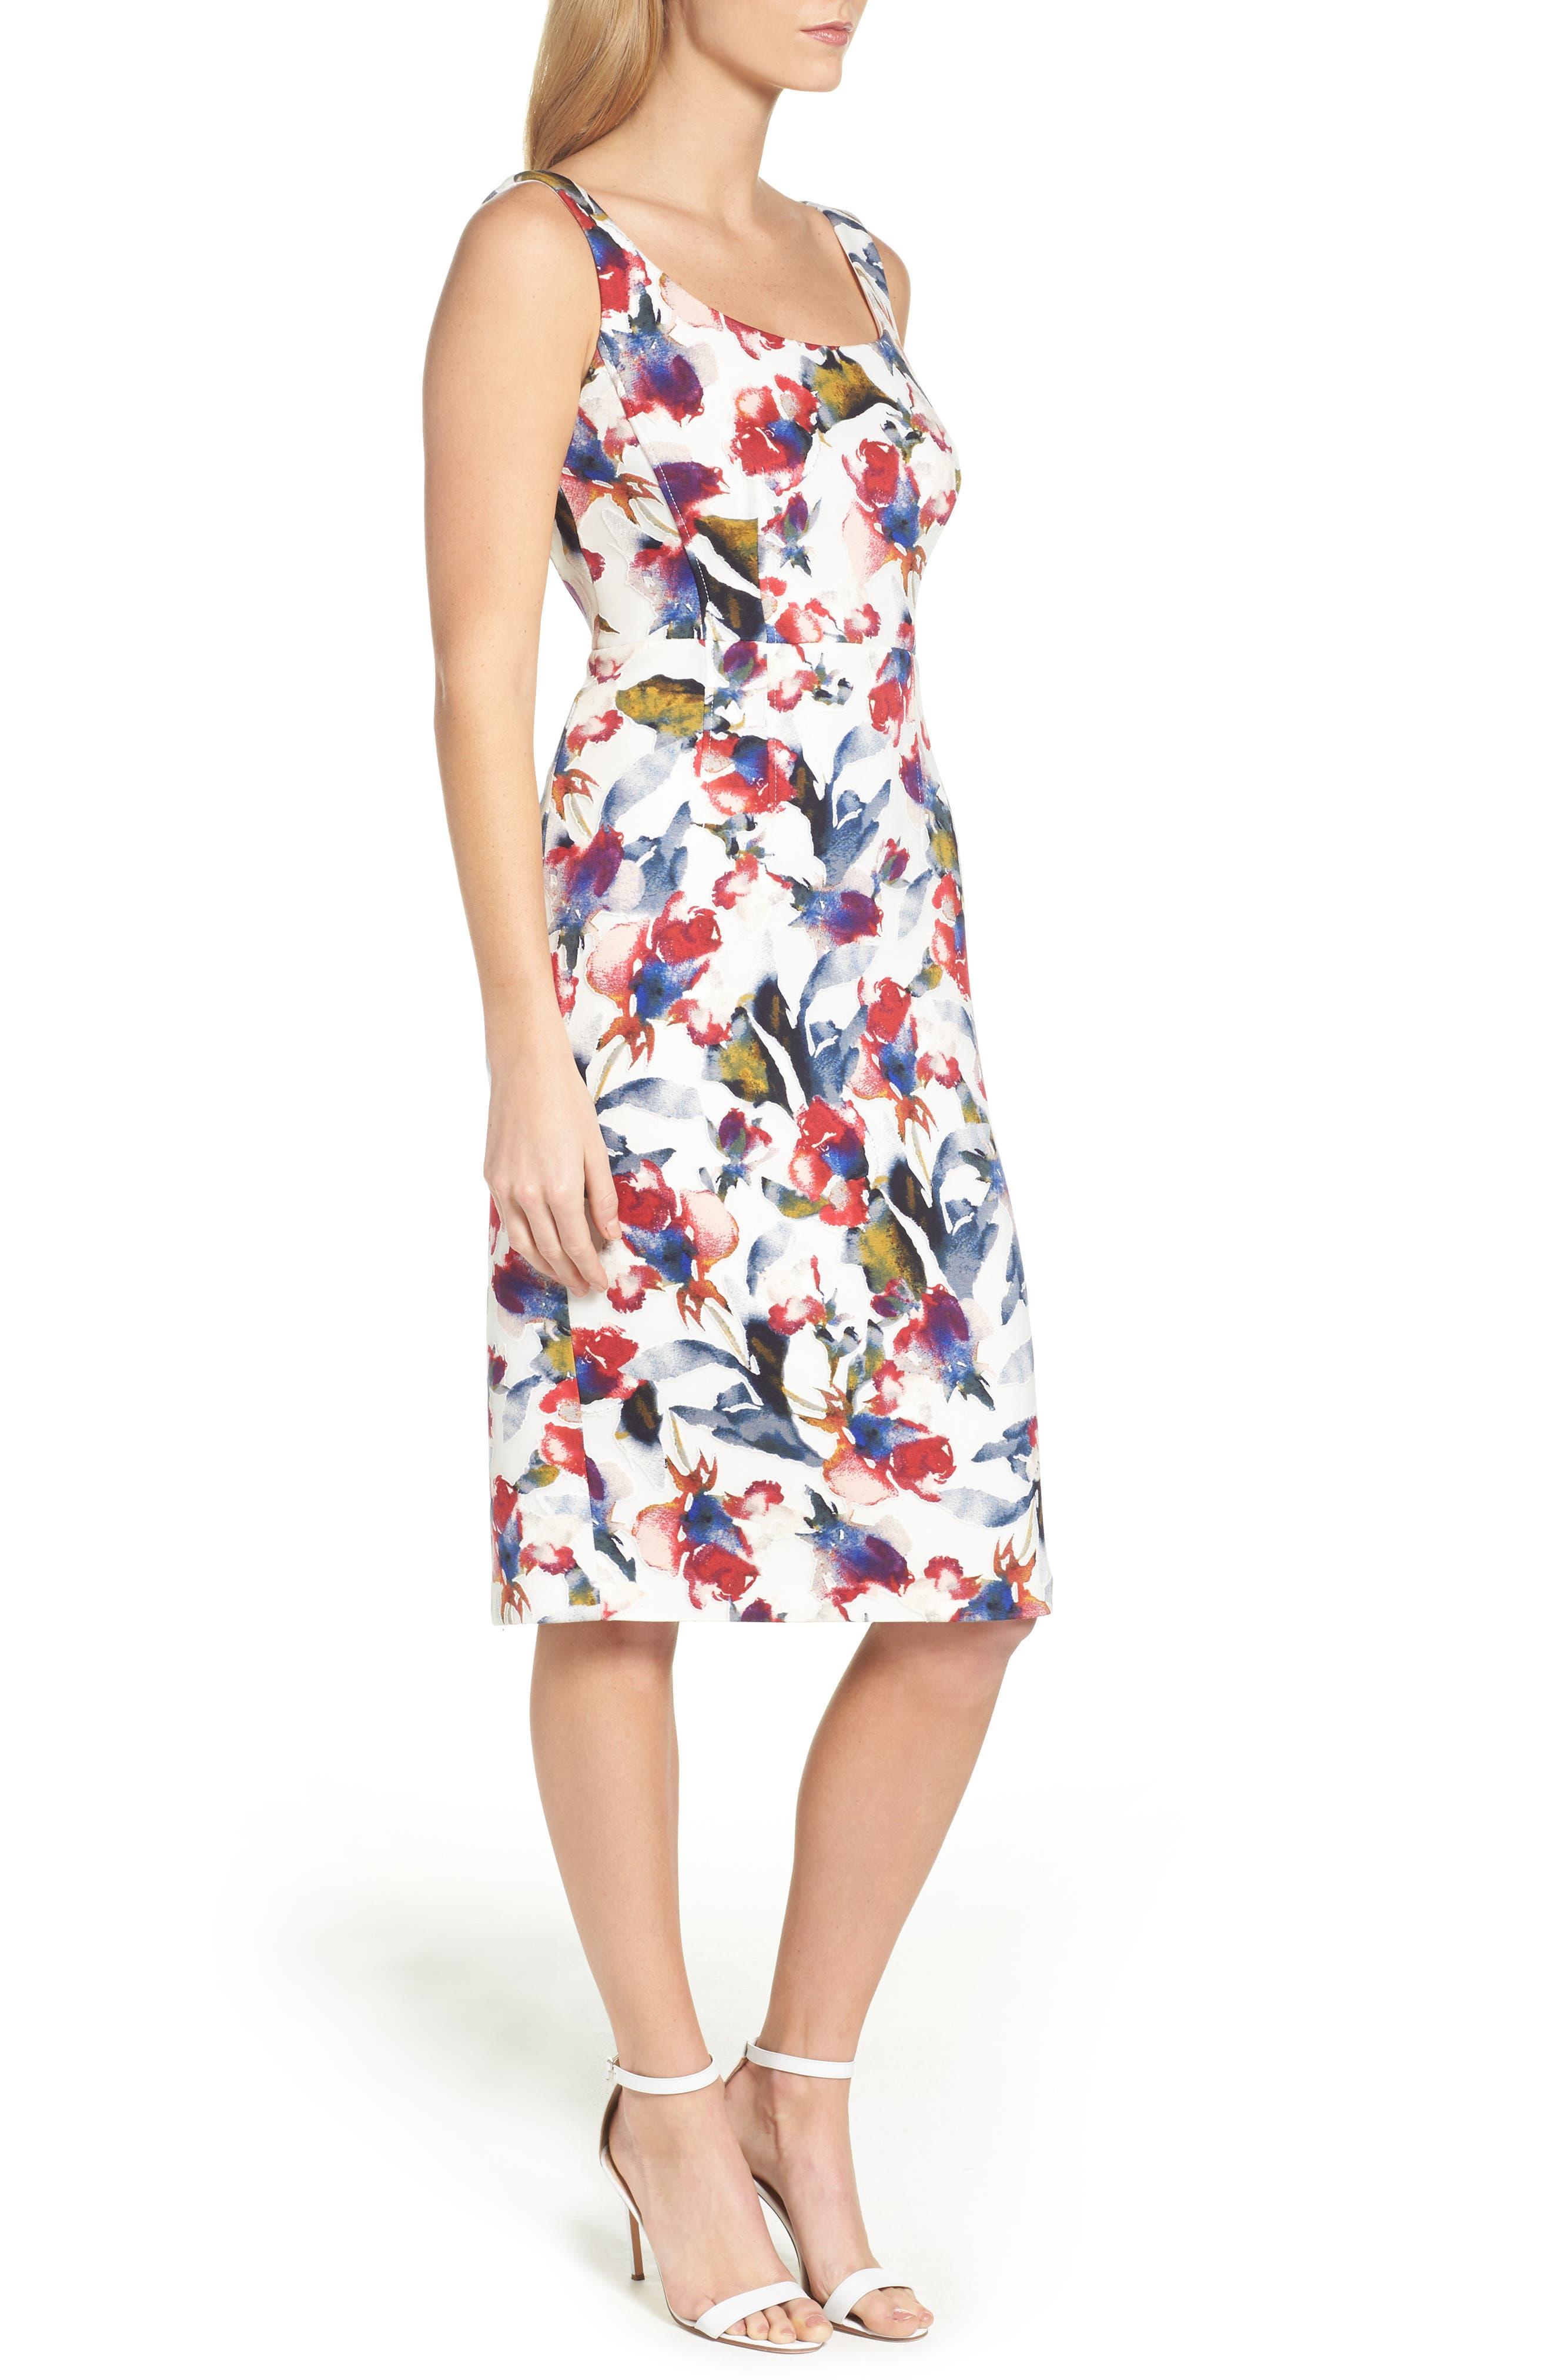 MAGGY LONDON, Tea Rose Dress, Alternate thumbnail 3, color, 145